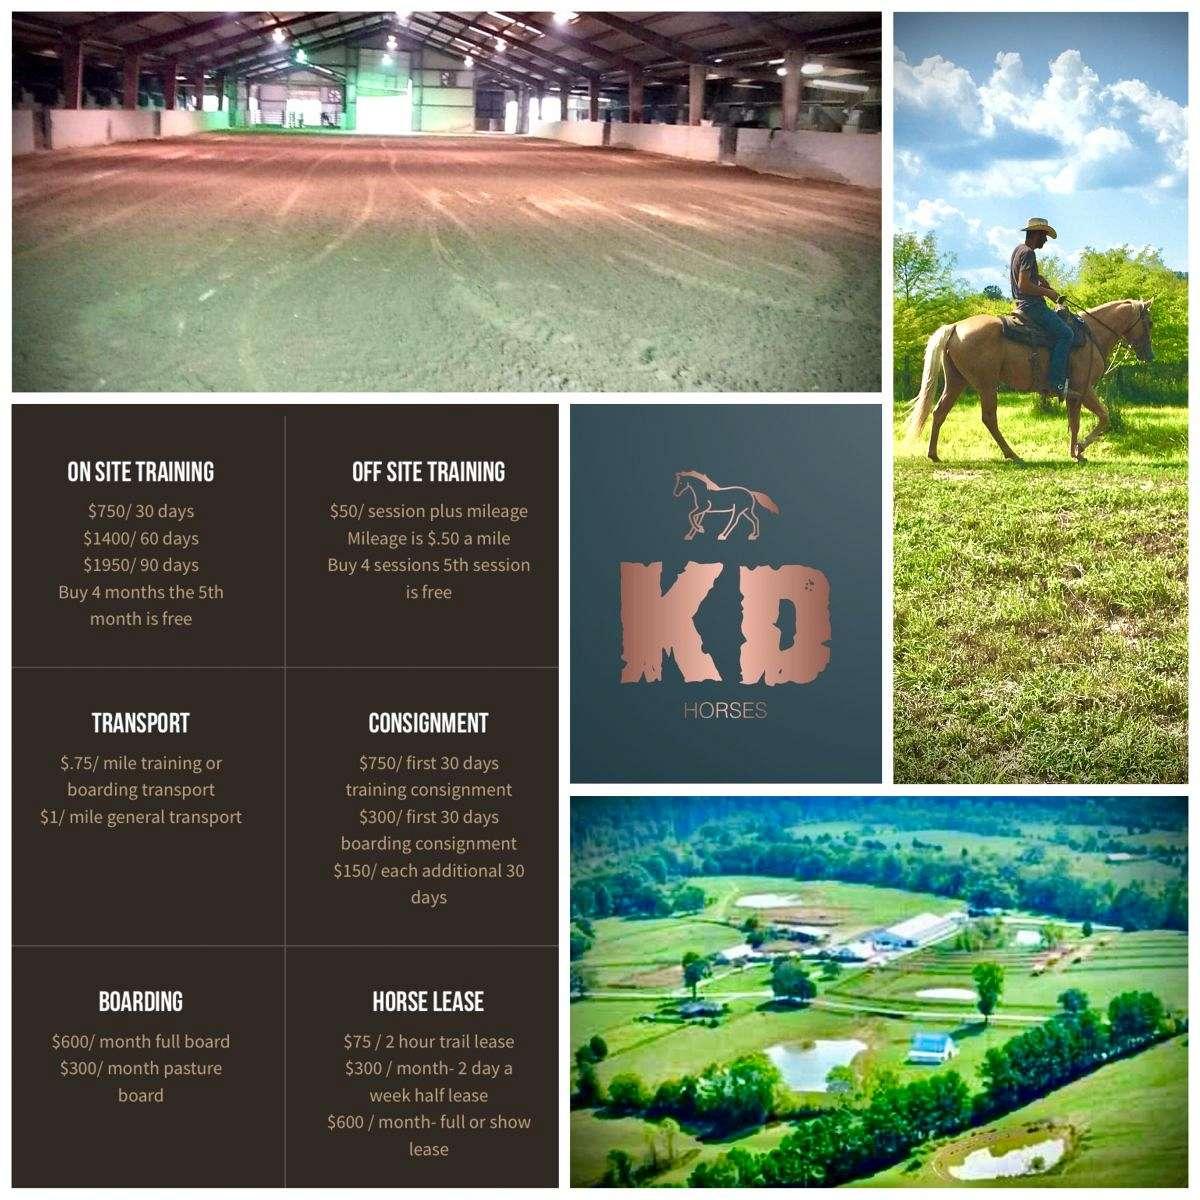 KD Horses